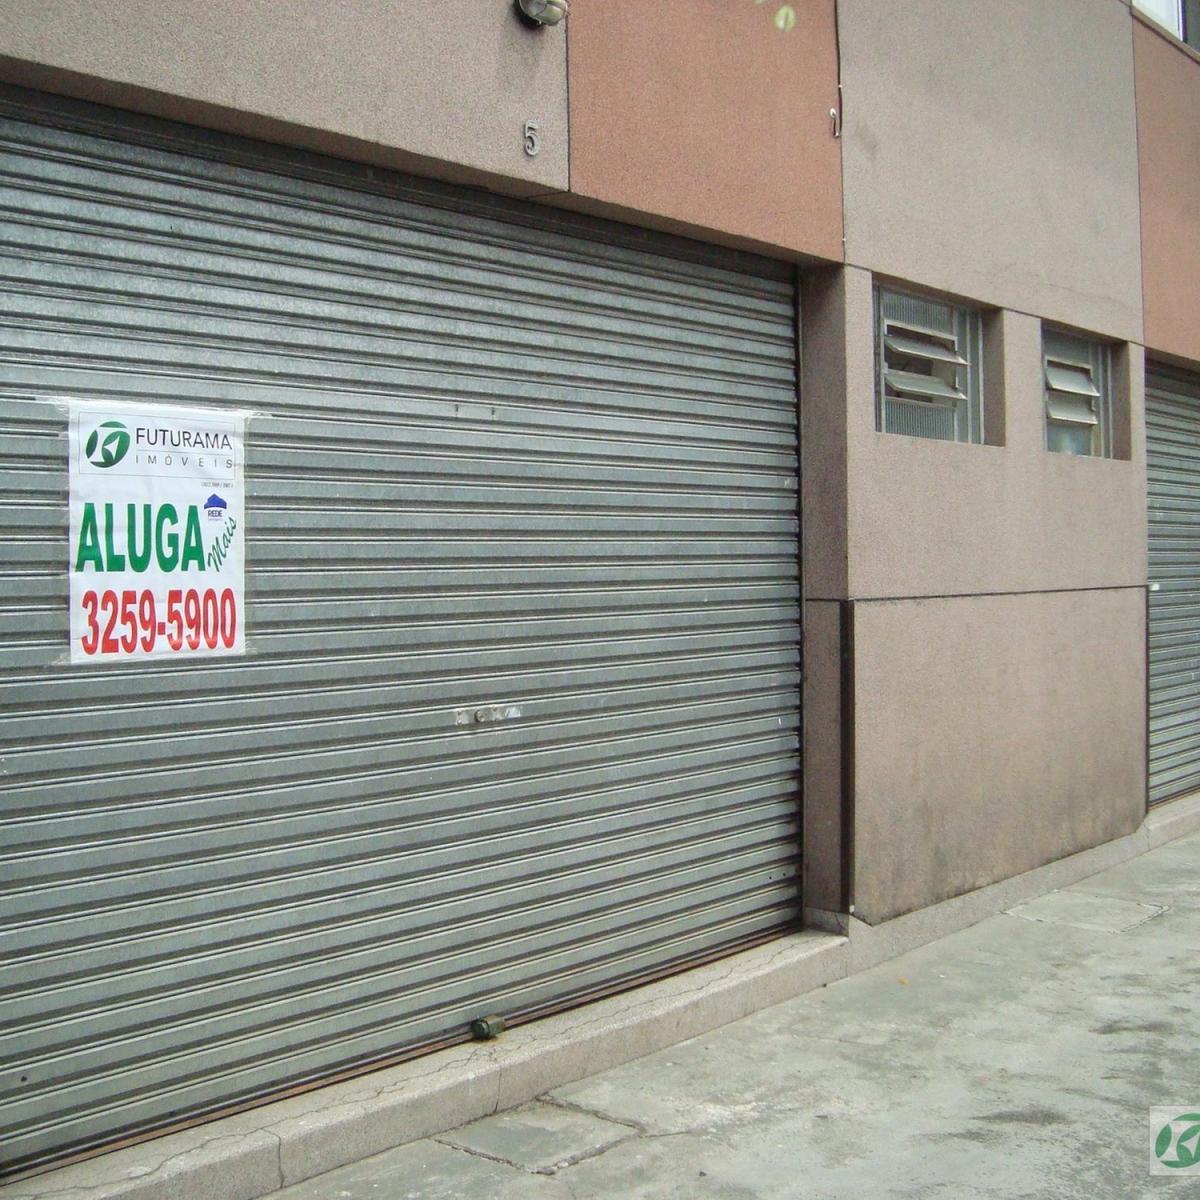 Imagens de #786253  para aluguel em bacacheri rua carlos cesarini 56 bacacheri curitiba 1200x1200 px 1930 Box Para Banheiro Curitiba Bacacheri